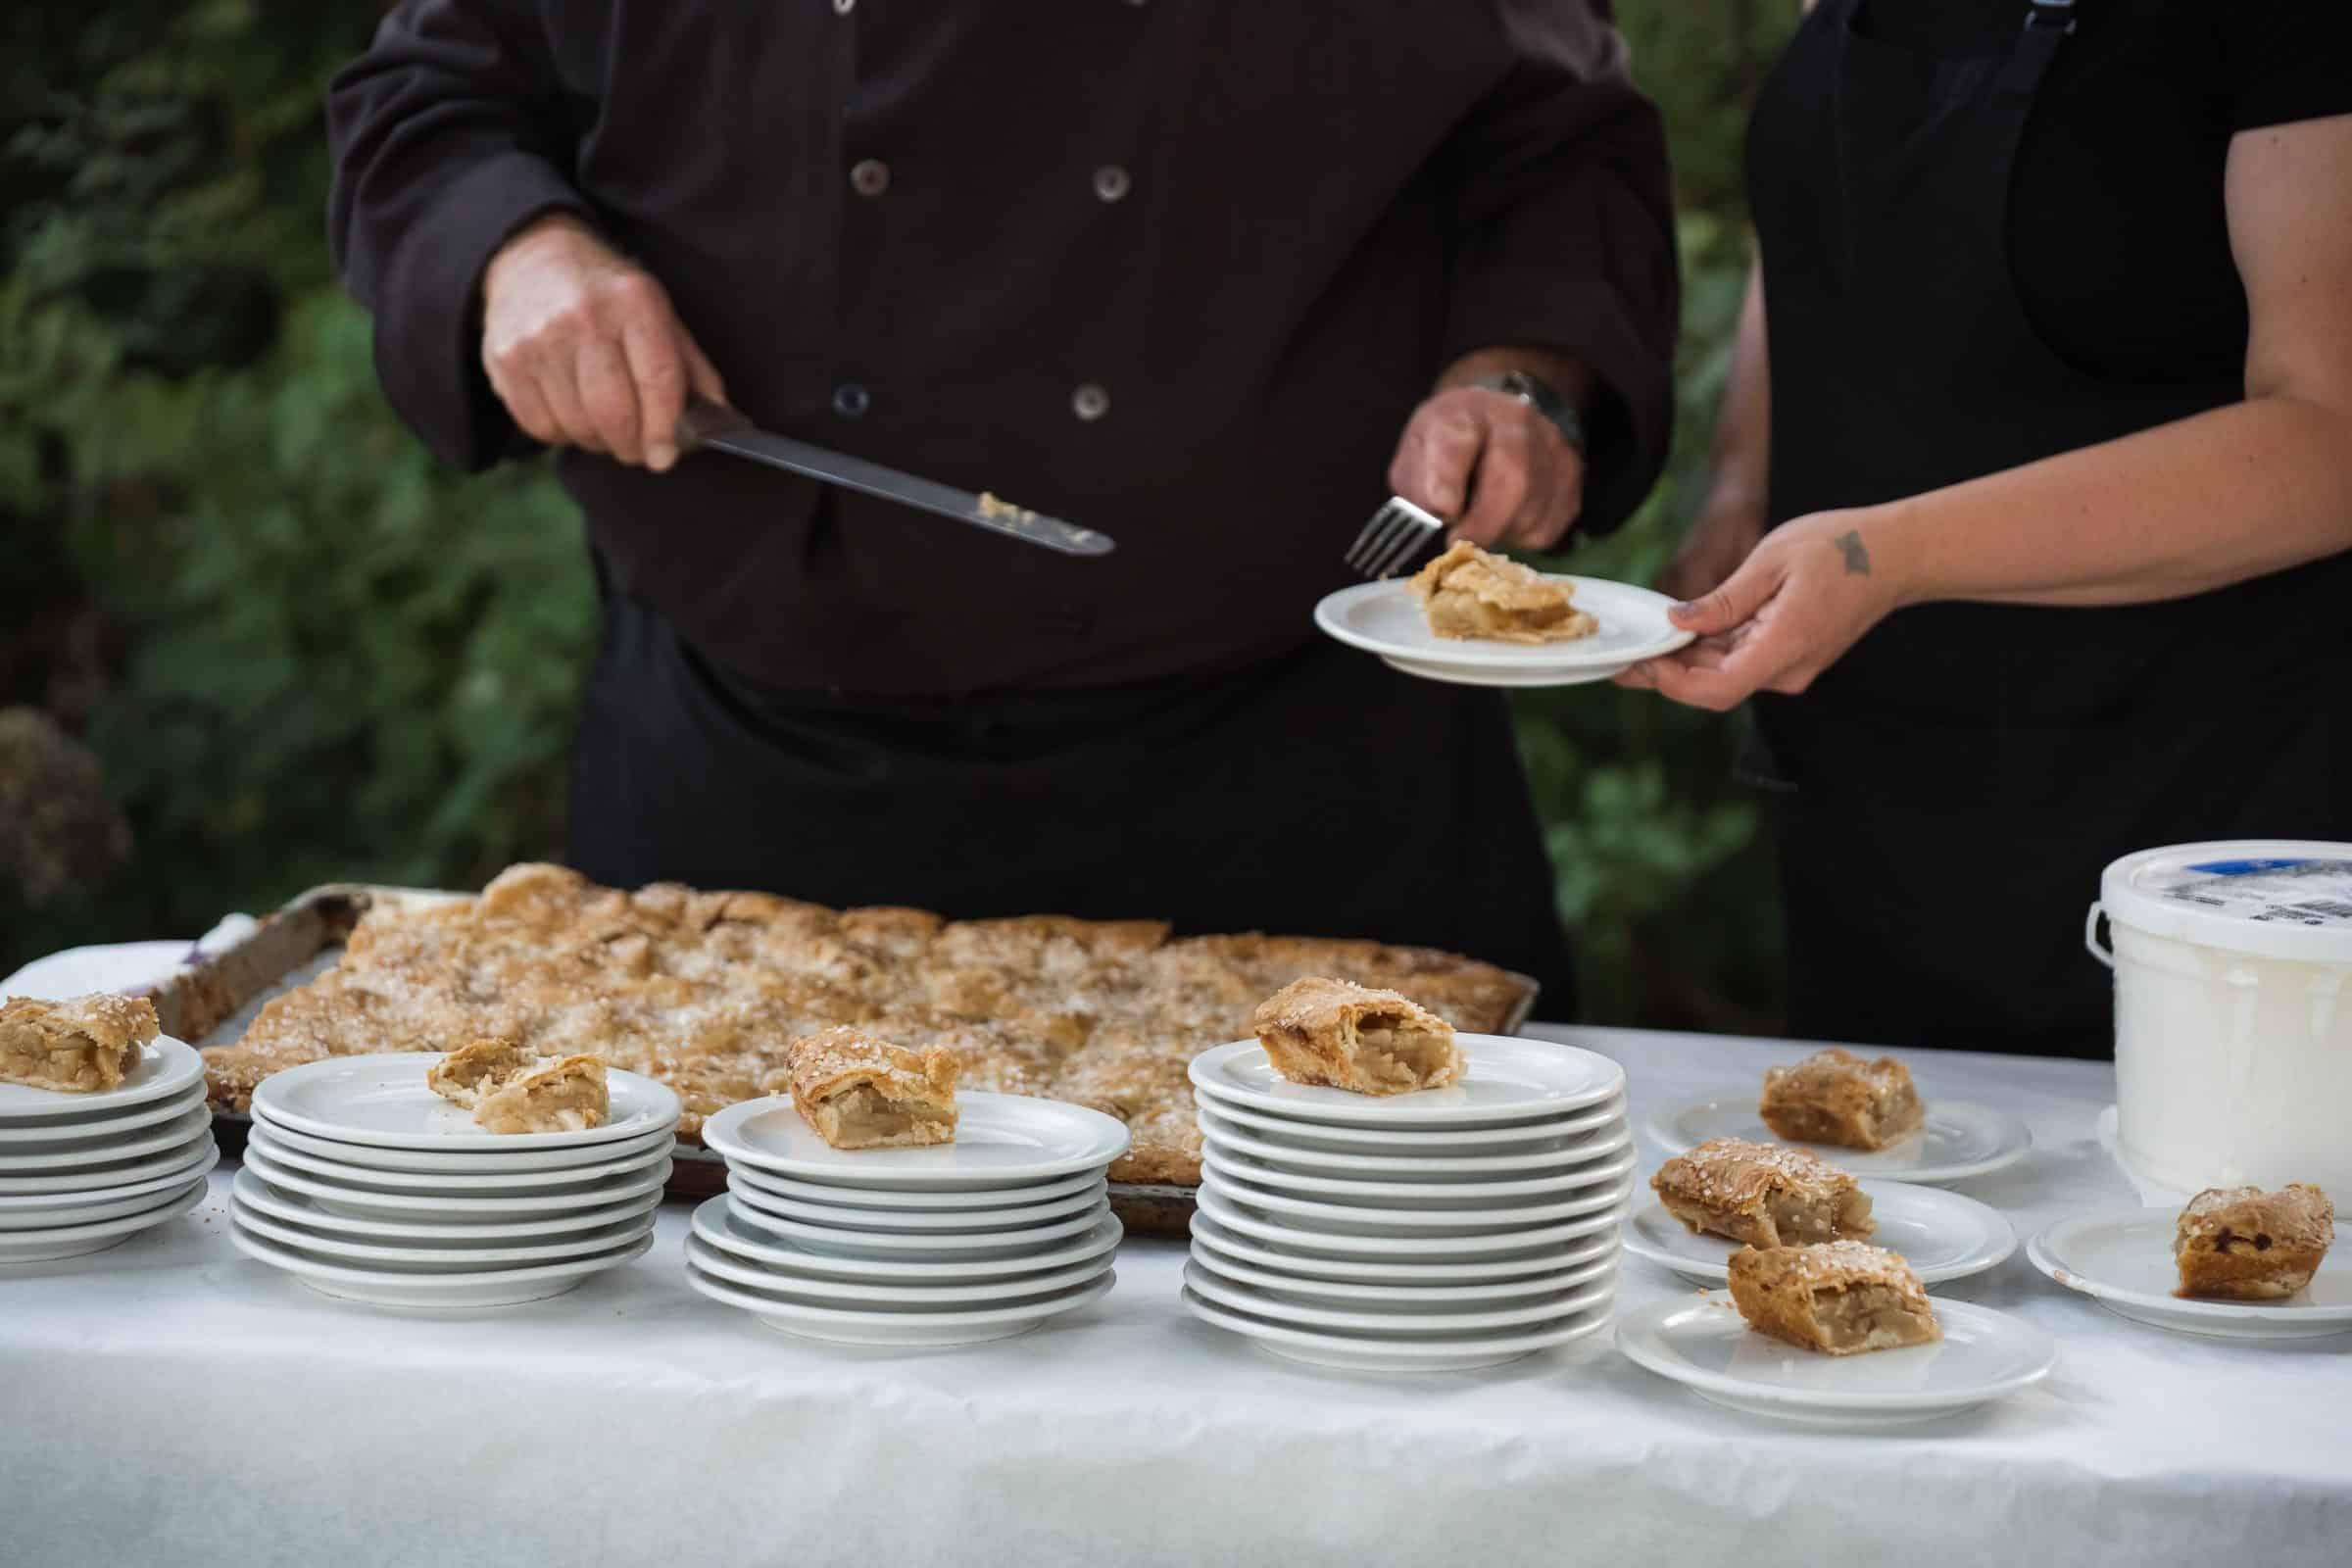 apple pie sitting on dessert plates